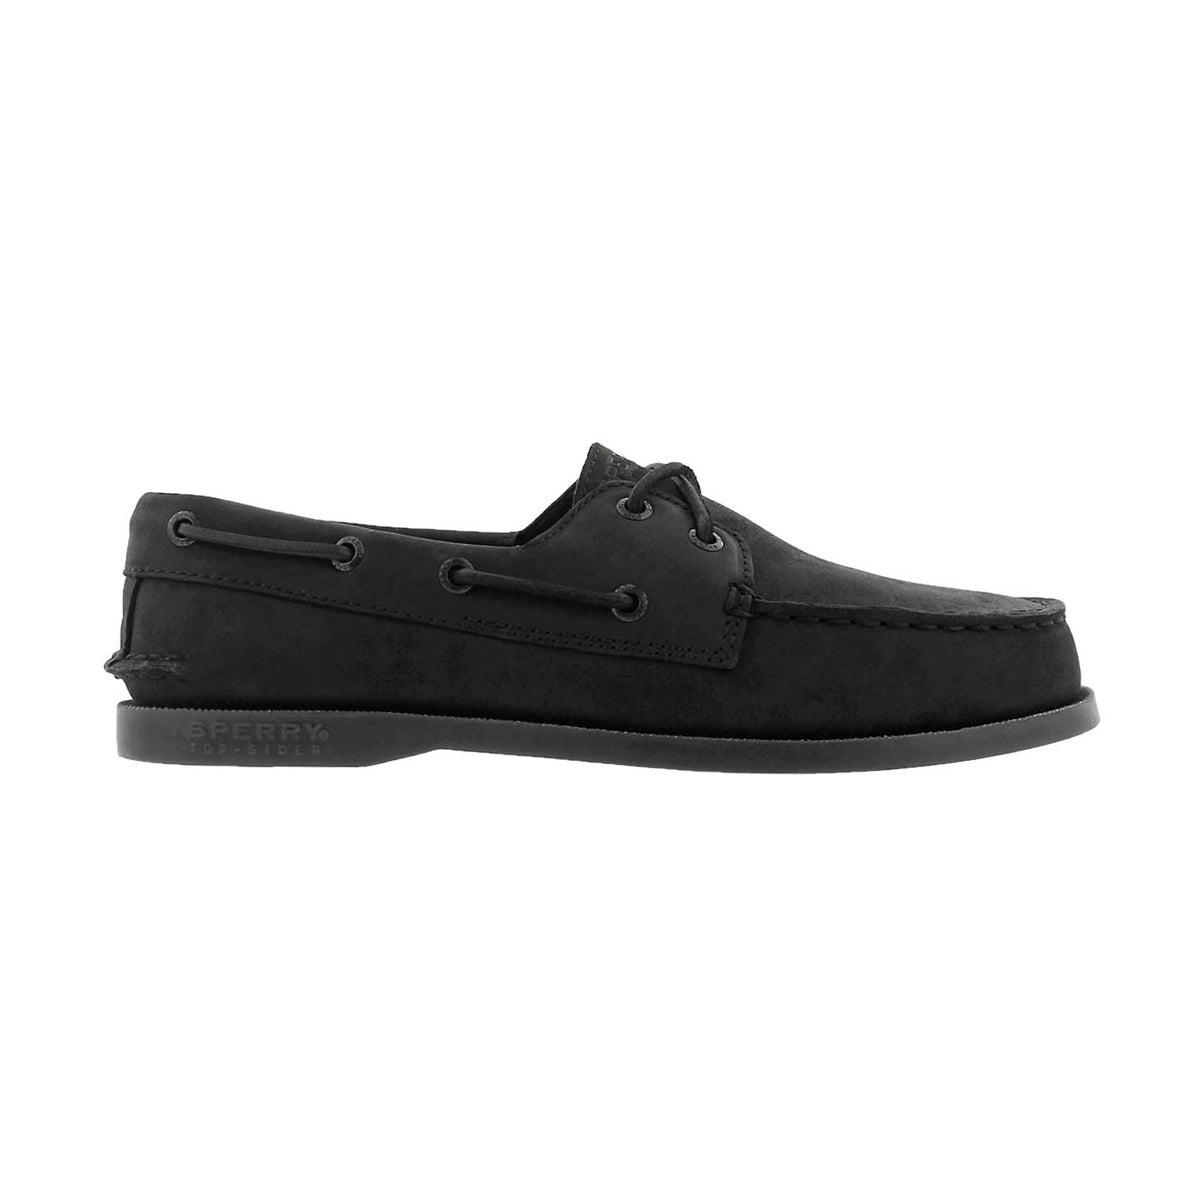 Chaussures AUTHENTIC ORIGINAL, nubuck noir, garçon